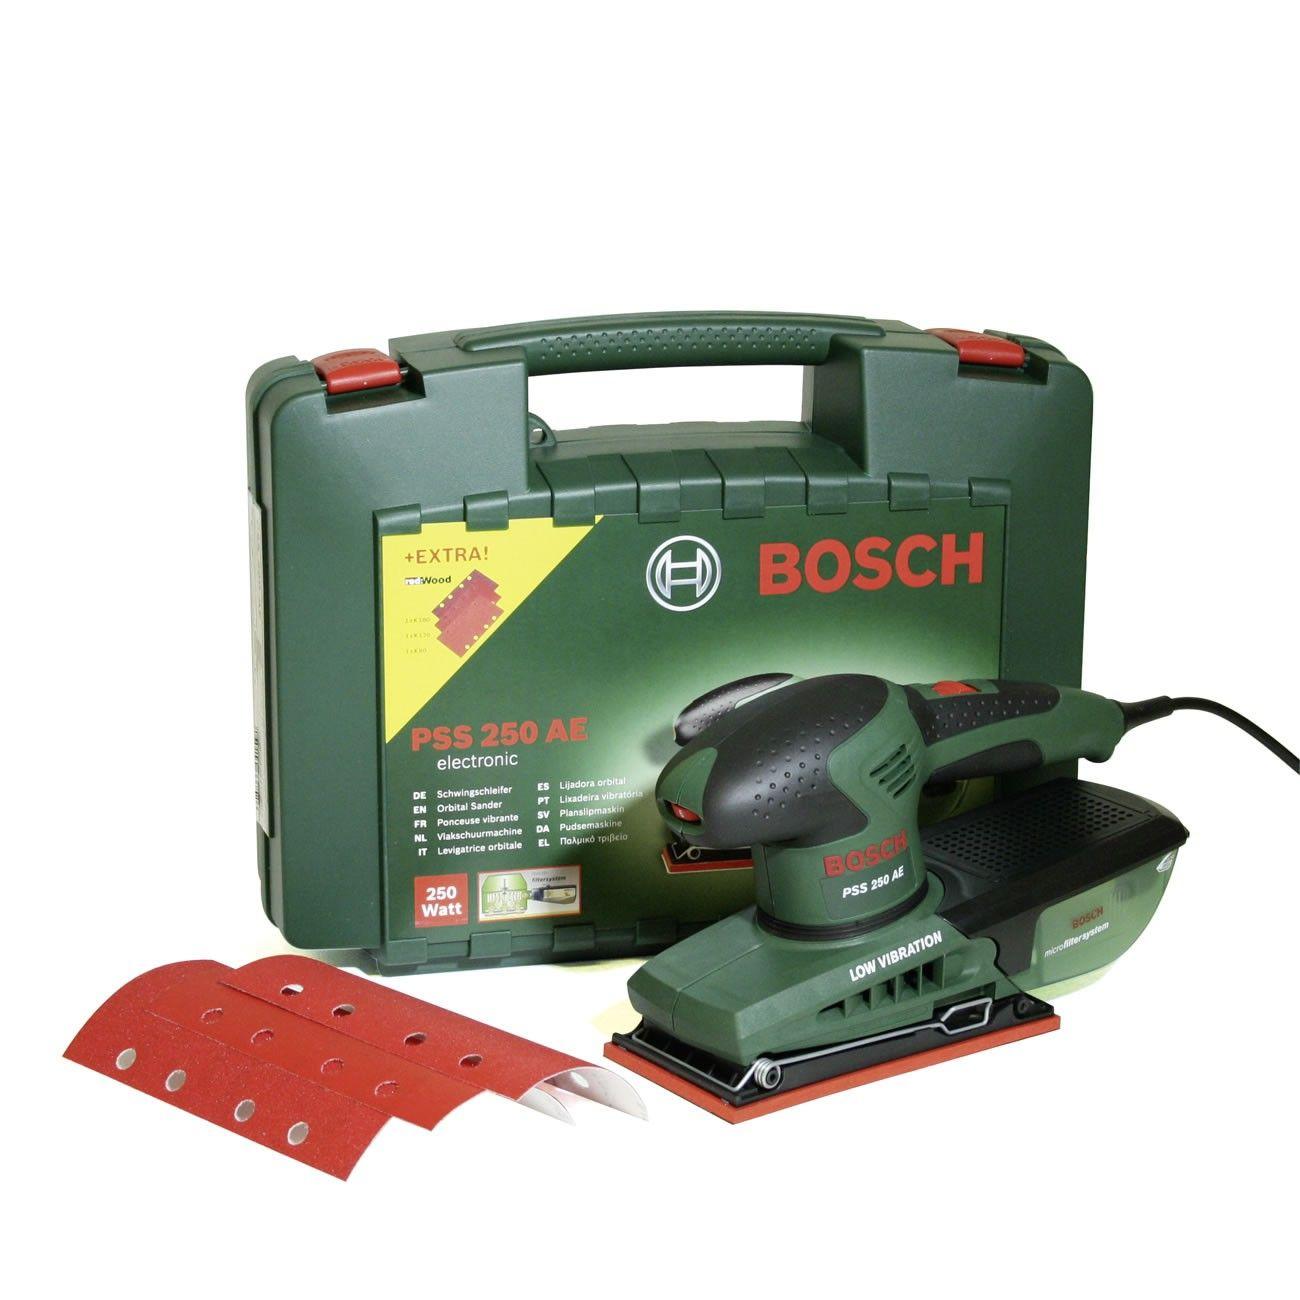 Fabulous Bosch PSS 250 AE kopen? | Snelle levering - Fixami.be OU16